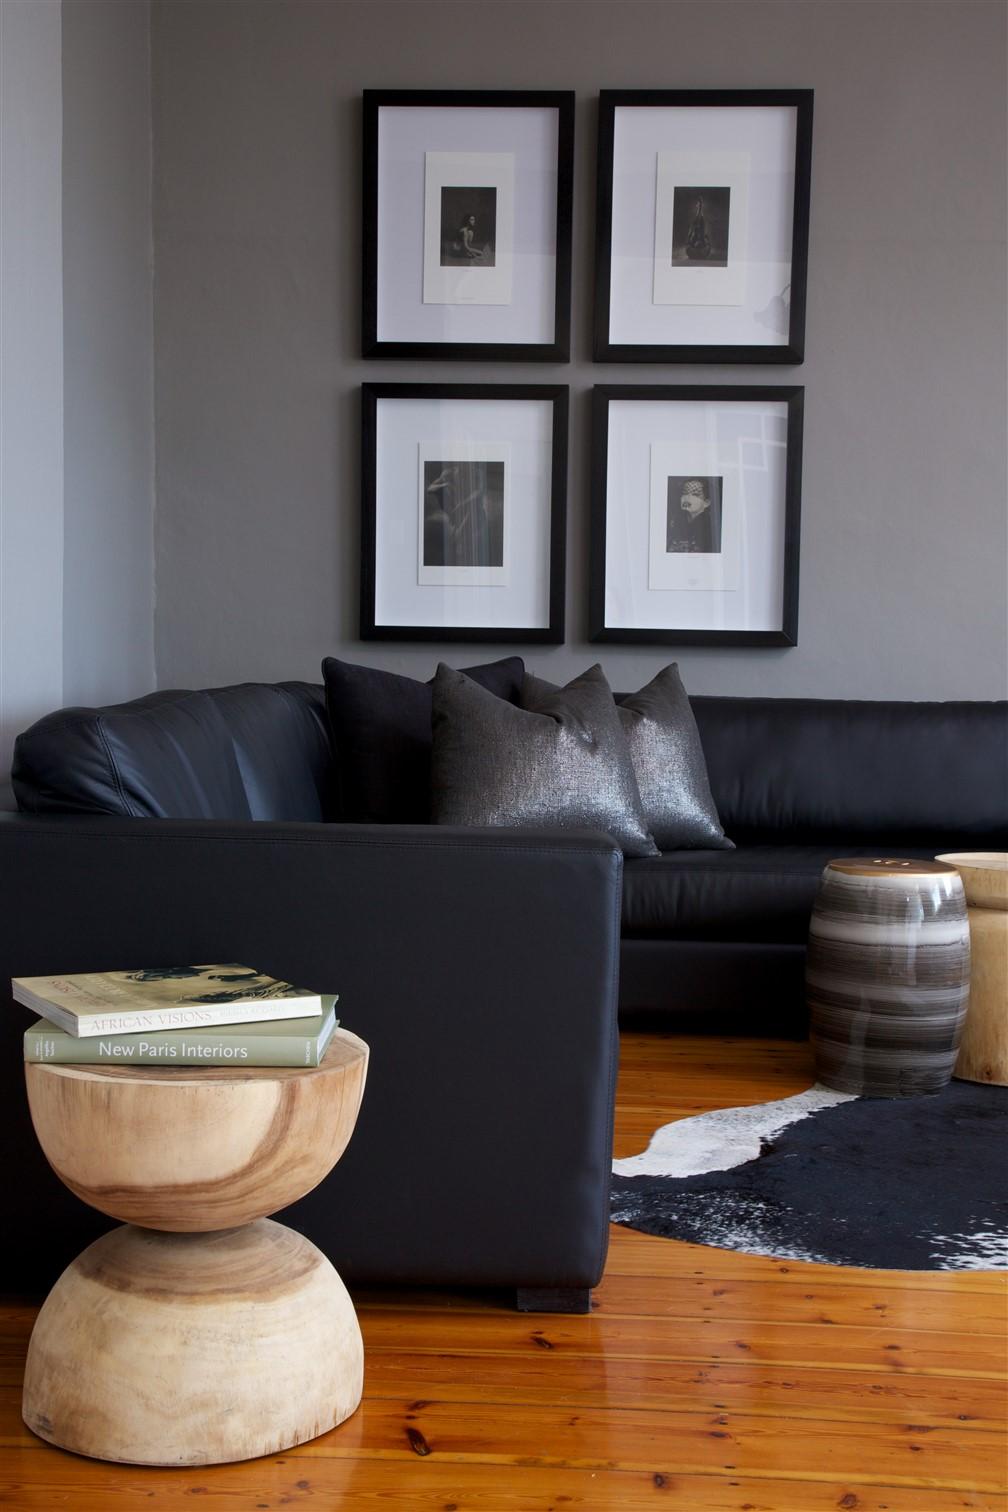 _G4B9199 green point lounge 1 (1008 x 1512)